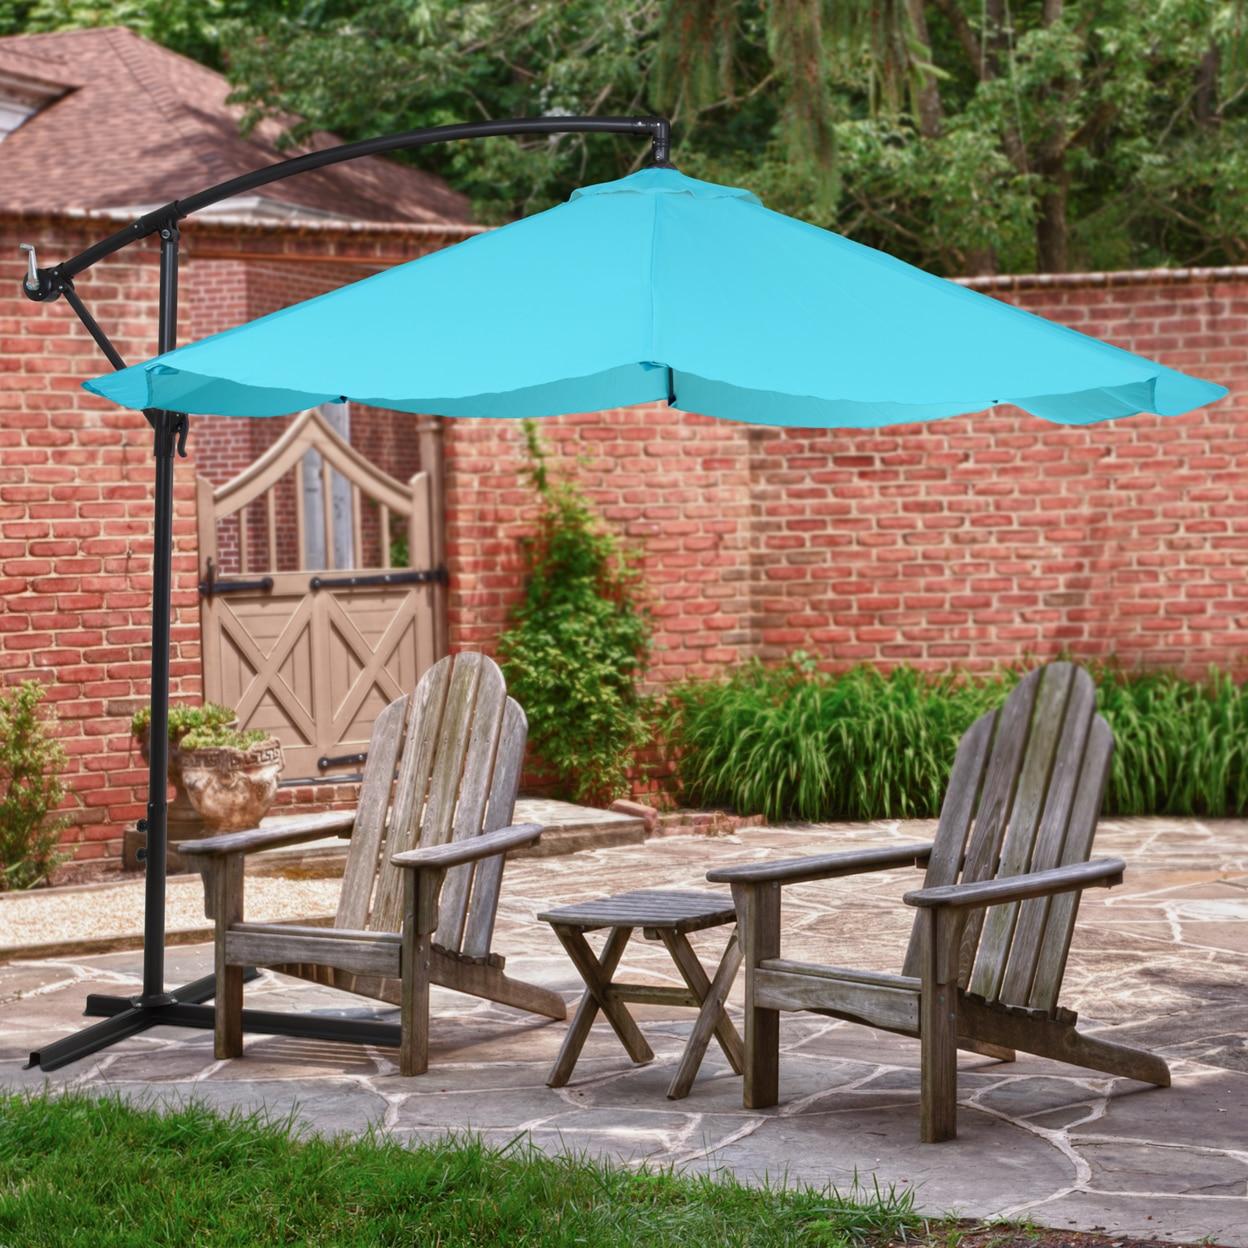 Pure Garden Offset 10 Foot Aluminum Hanging Patio Umbrella the hanging garden